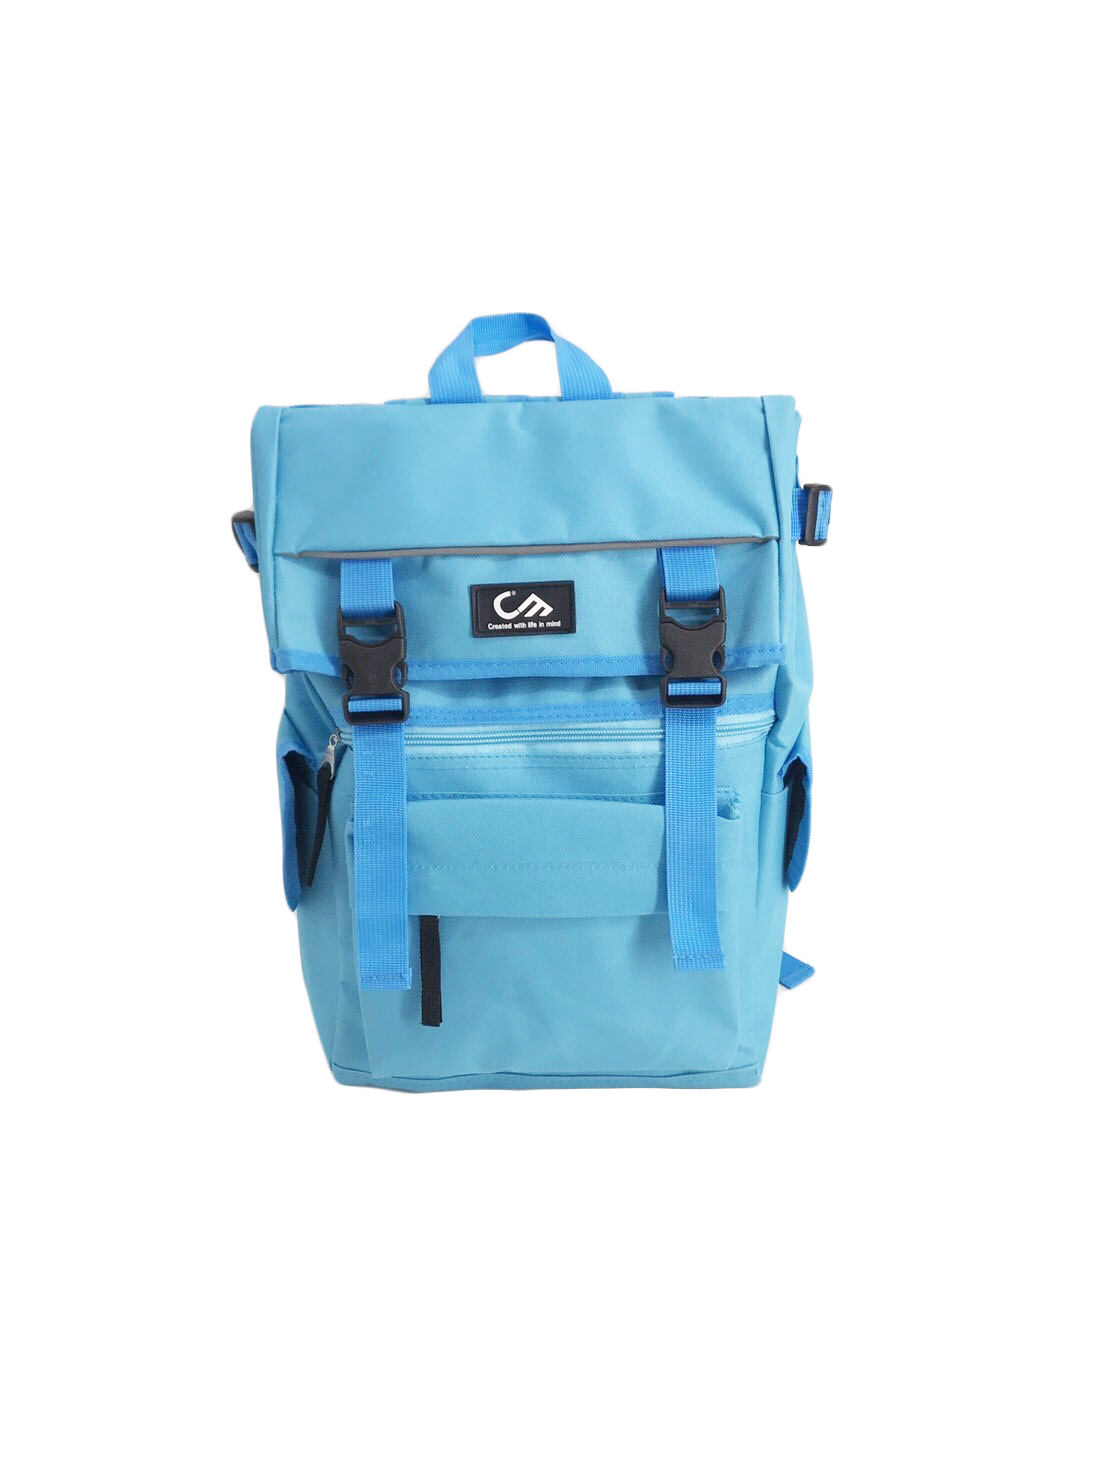 CM [S] Series I : Aqua Blue